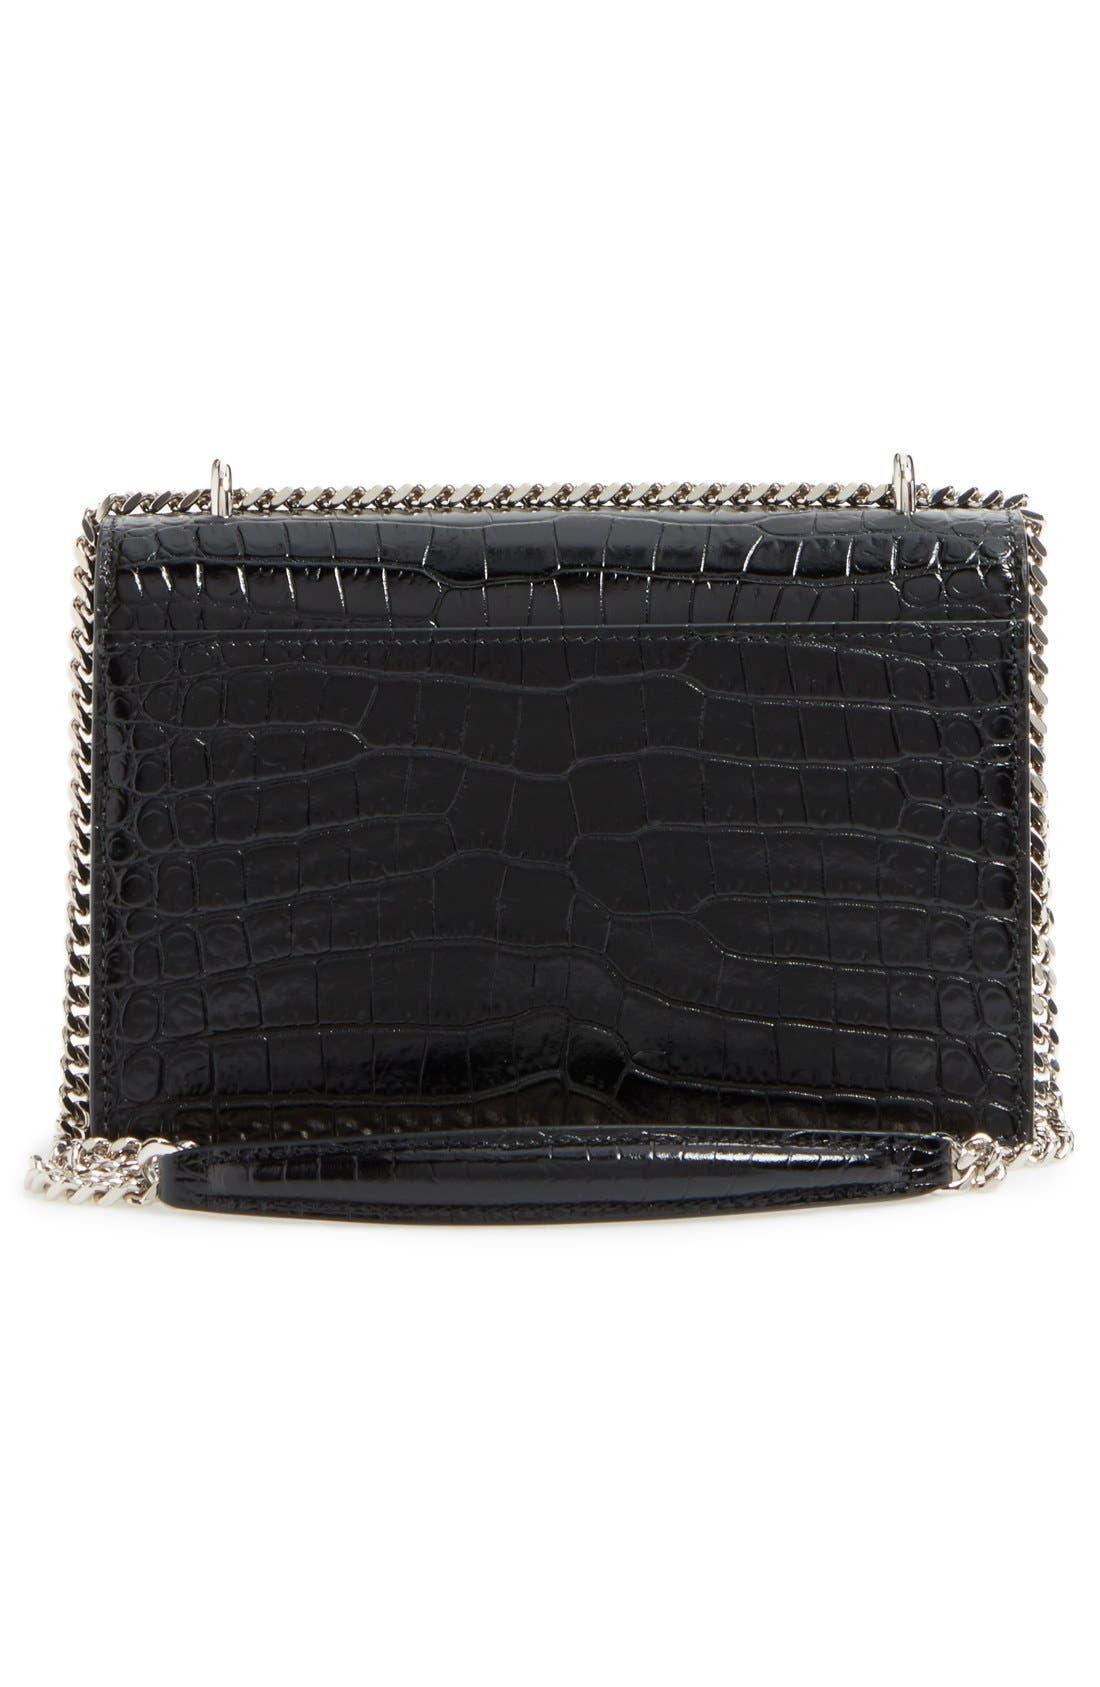 Alternate Image 3  - Saint Laurent Mini Monogram Sunset Croc Embossed Leather Shoulder Bag